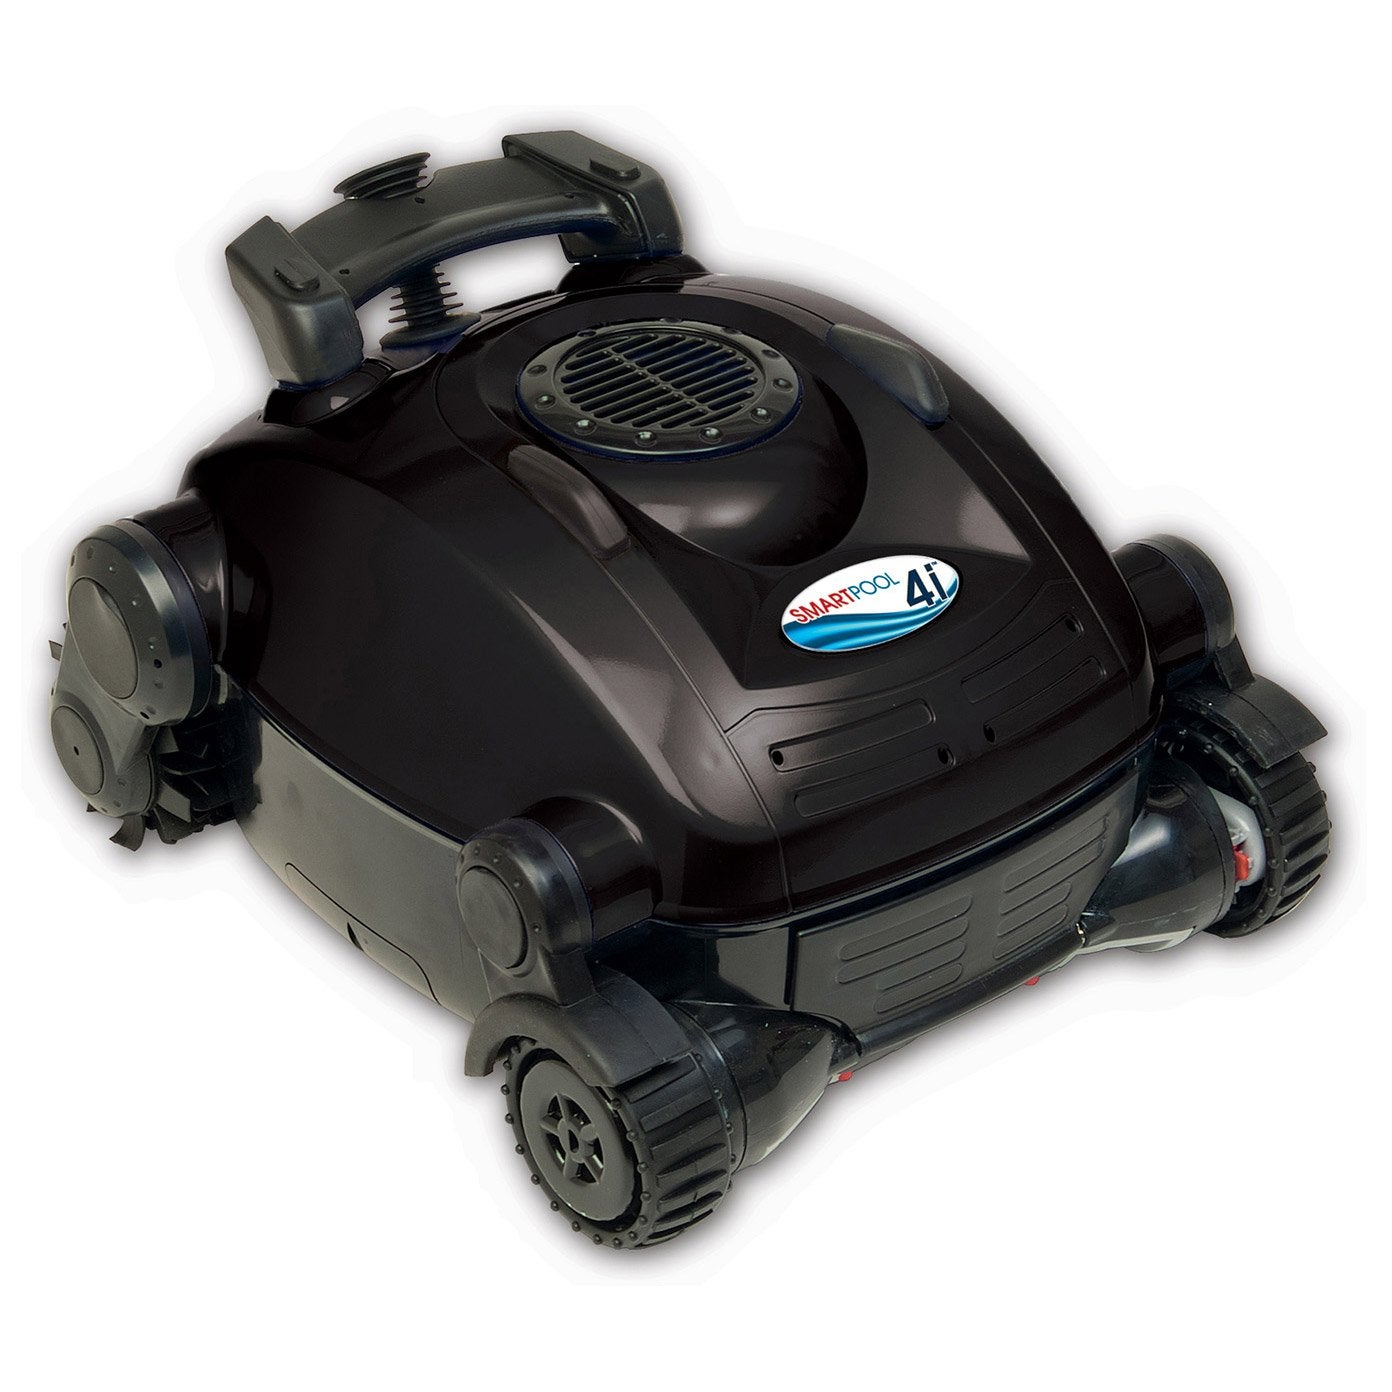 Leroy merlin robot piscine robot piscine leroy merlin 28 for Robot de nettoyage